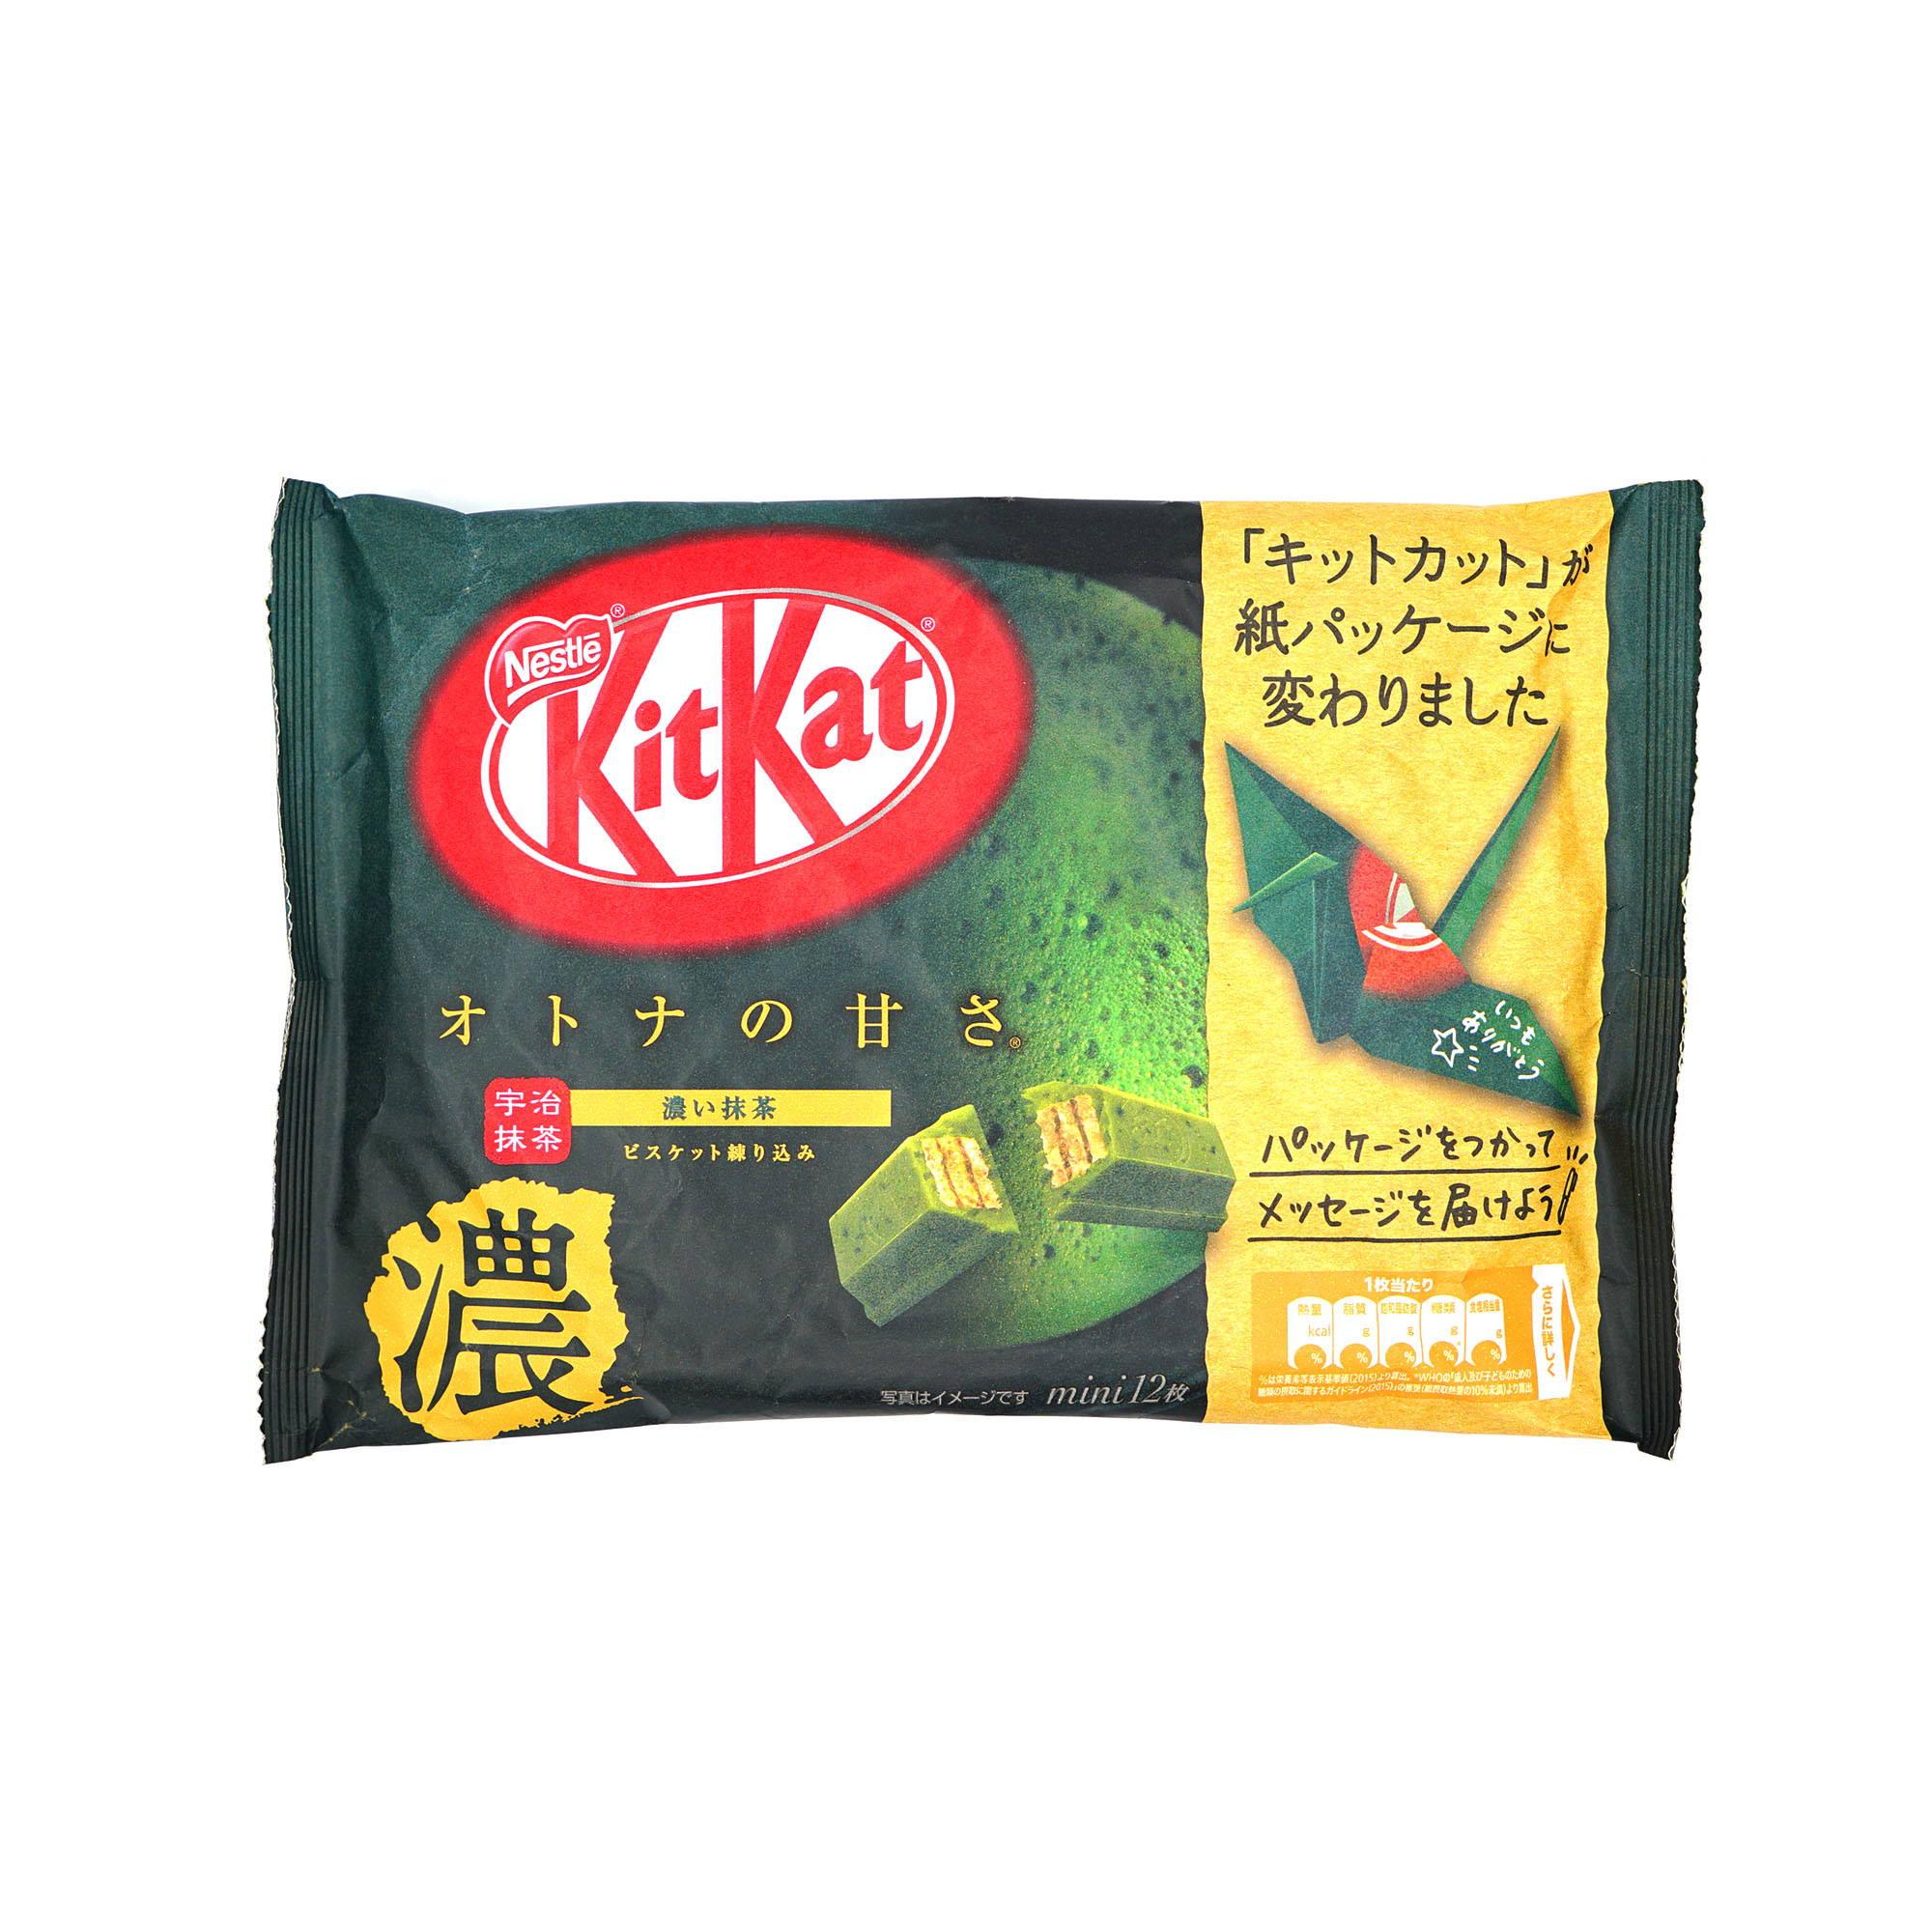 Japanese Kit Kat Dark Matcha Otona no Amasa